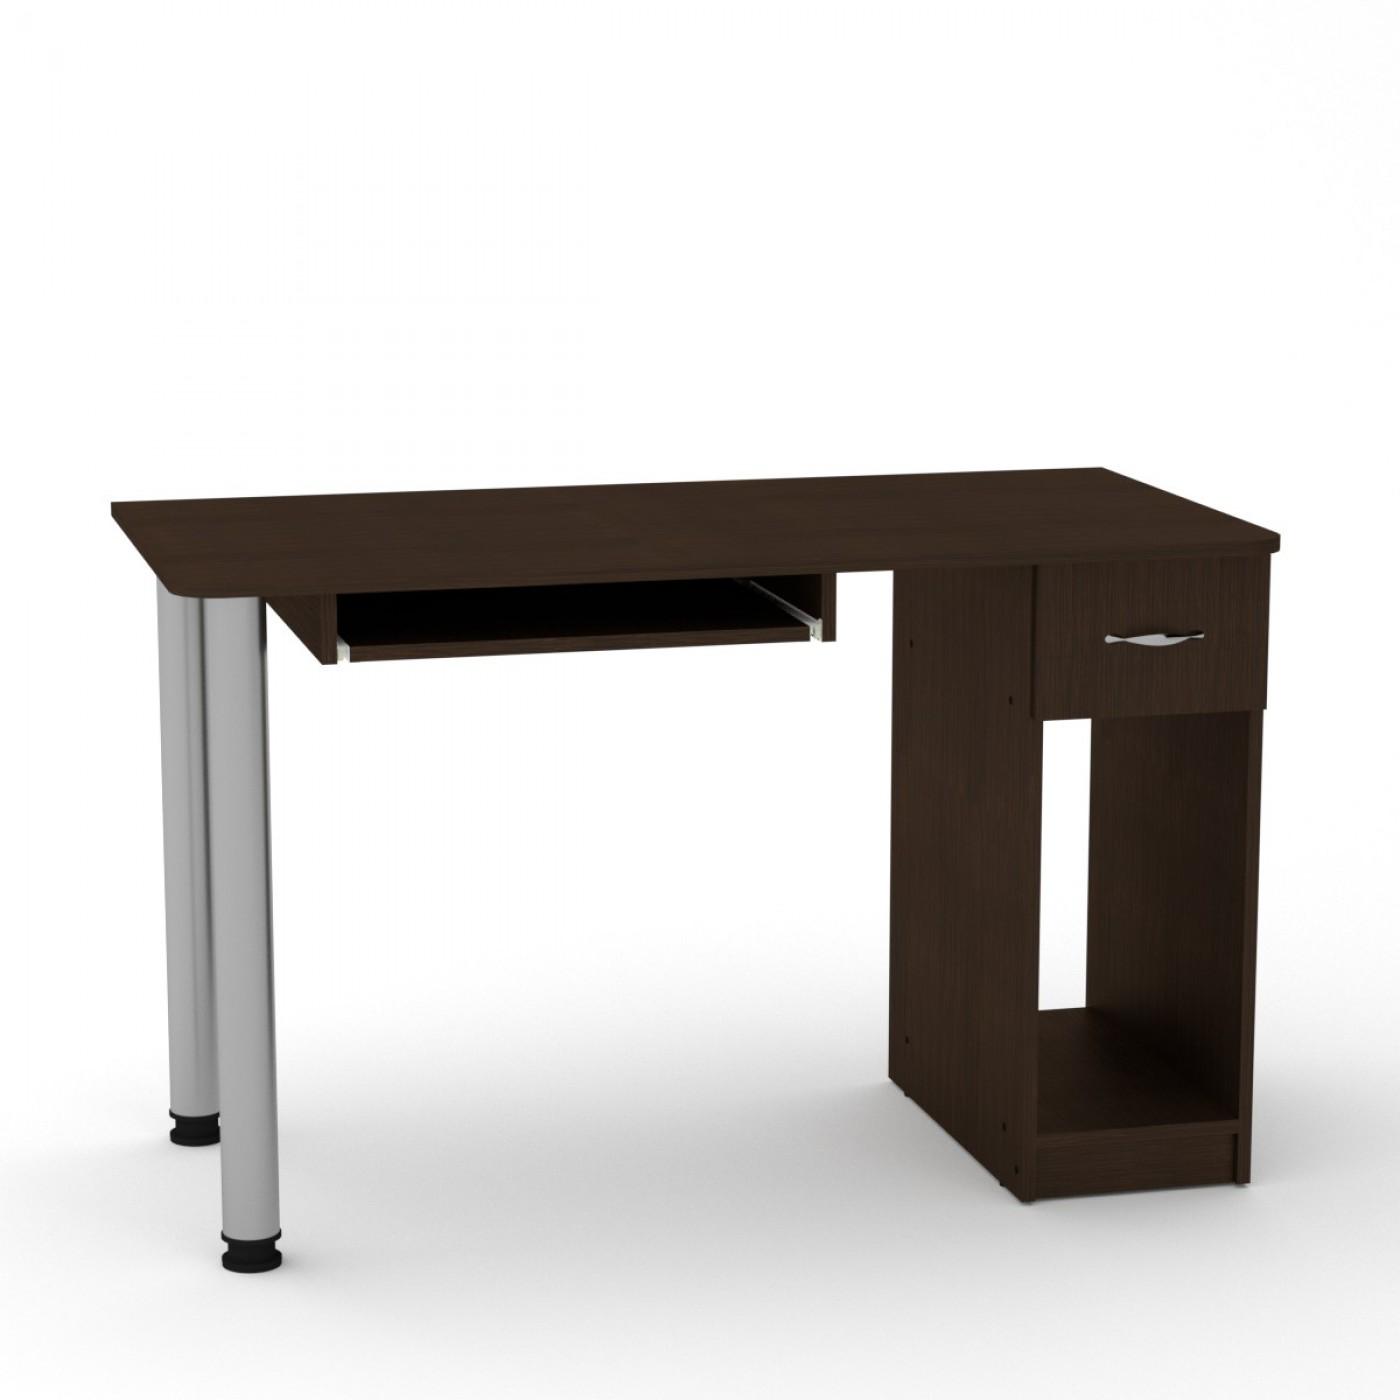 СКМ-10 стол компьютерный